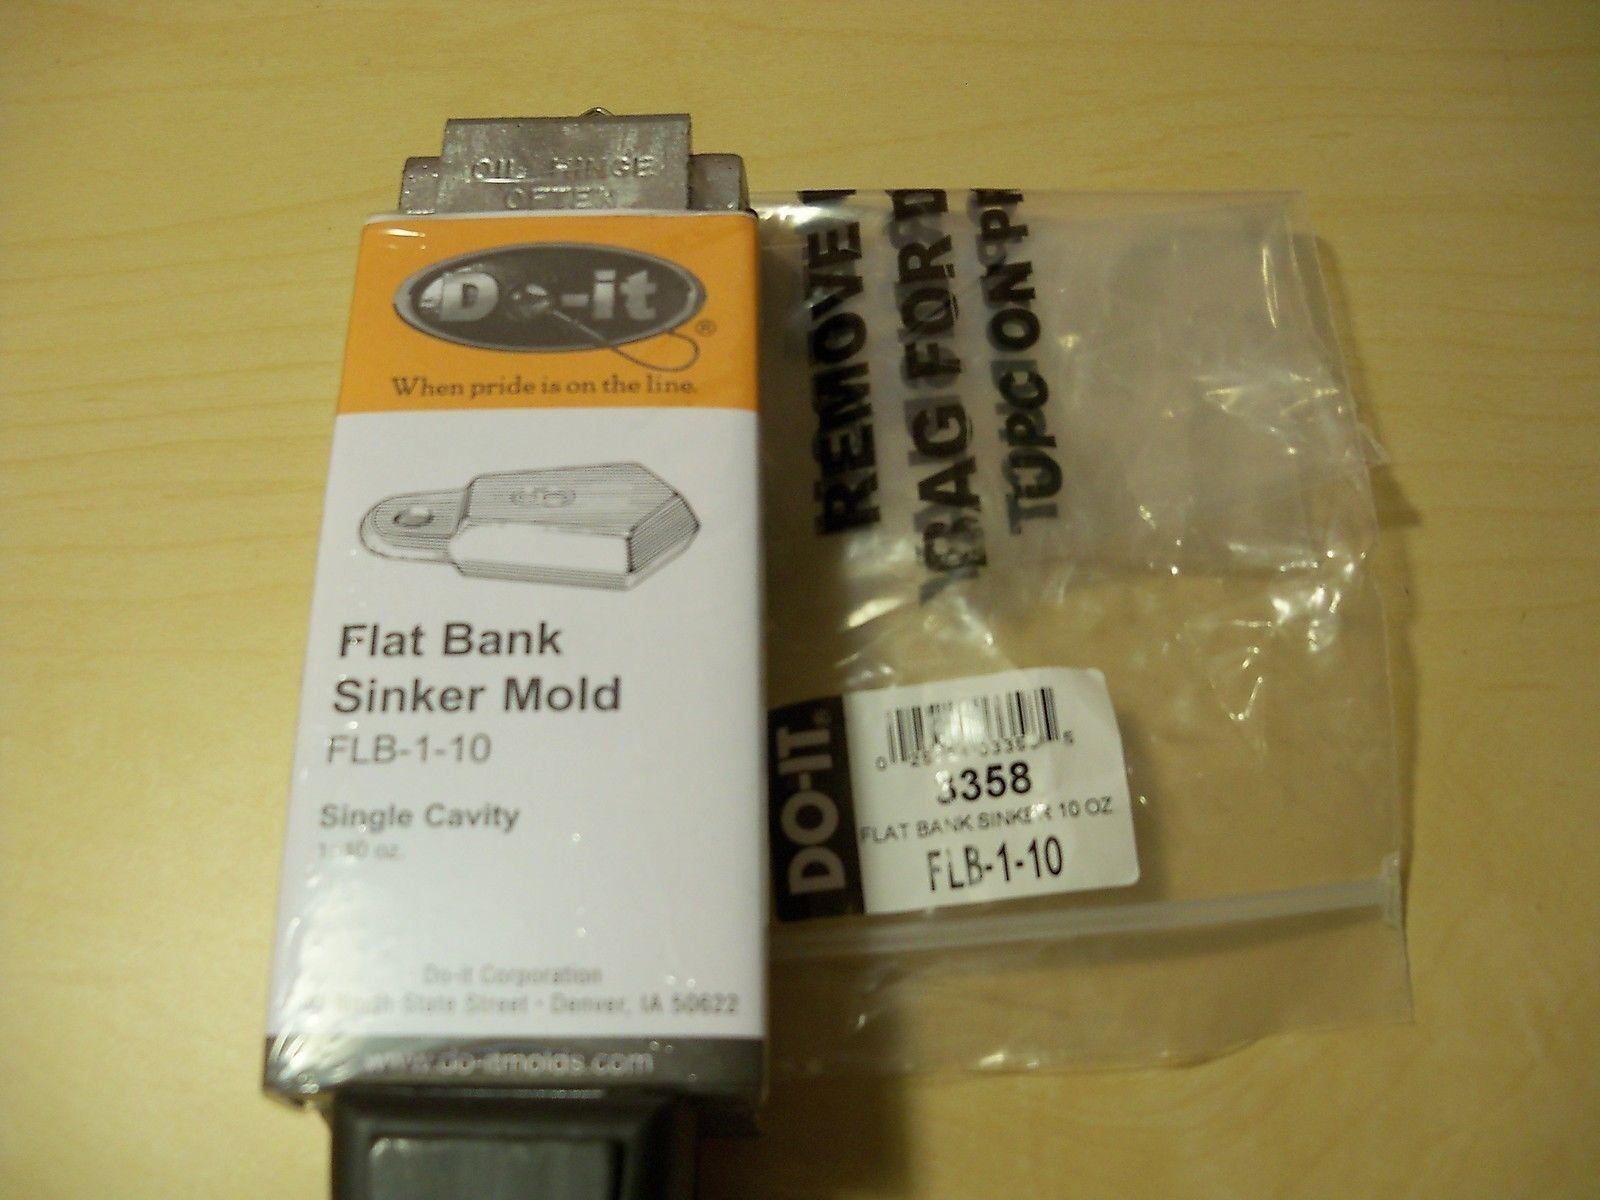 3358 NEW DO-IT SINKER MOLD FLAT BANK SIZE 10 oz., FLB-1-10